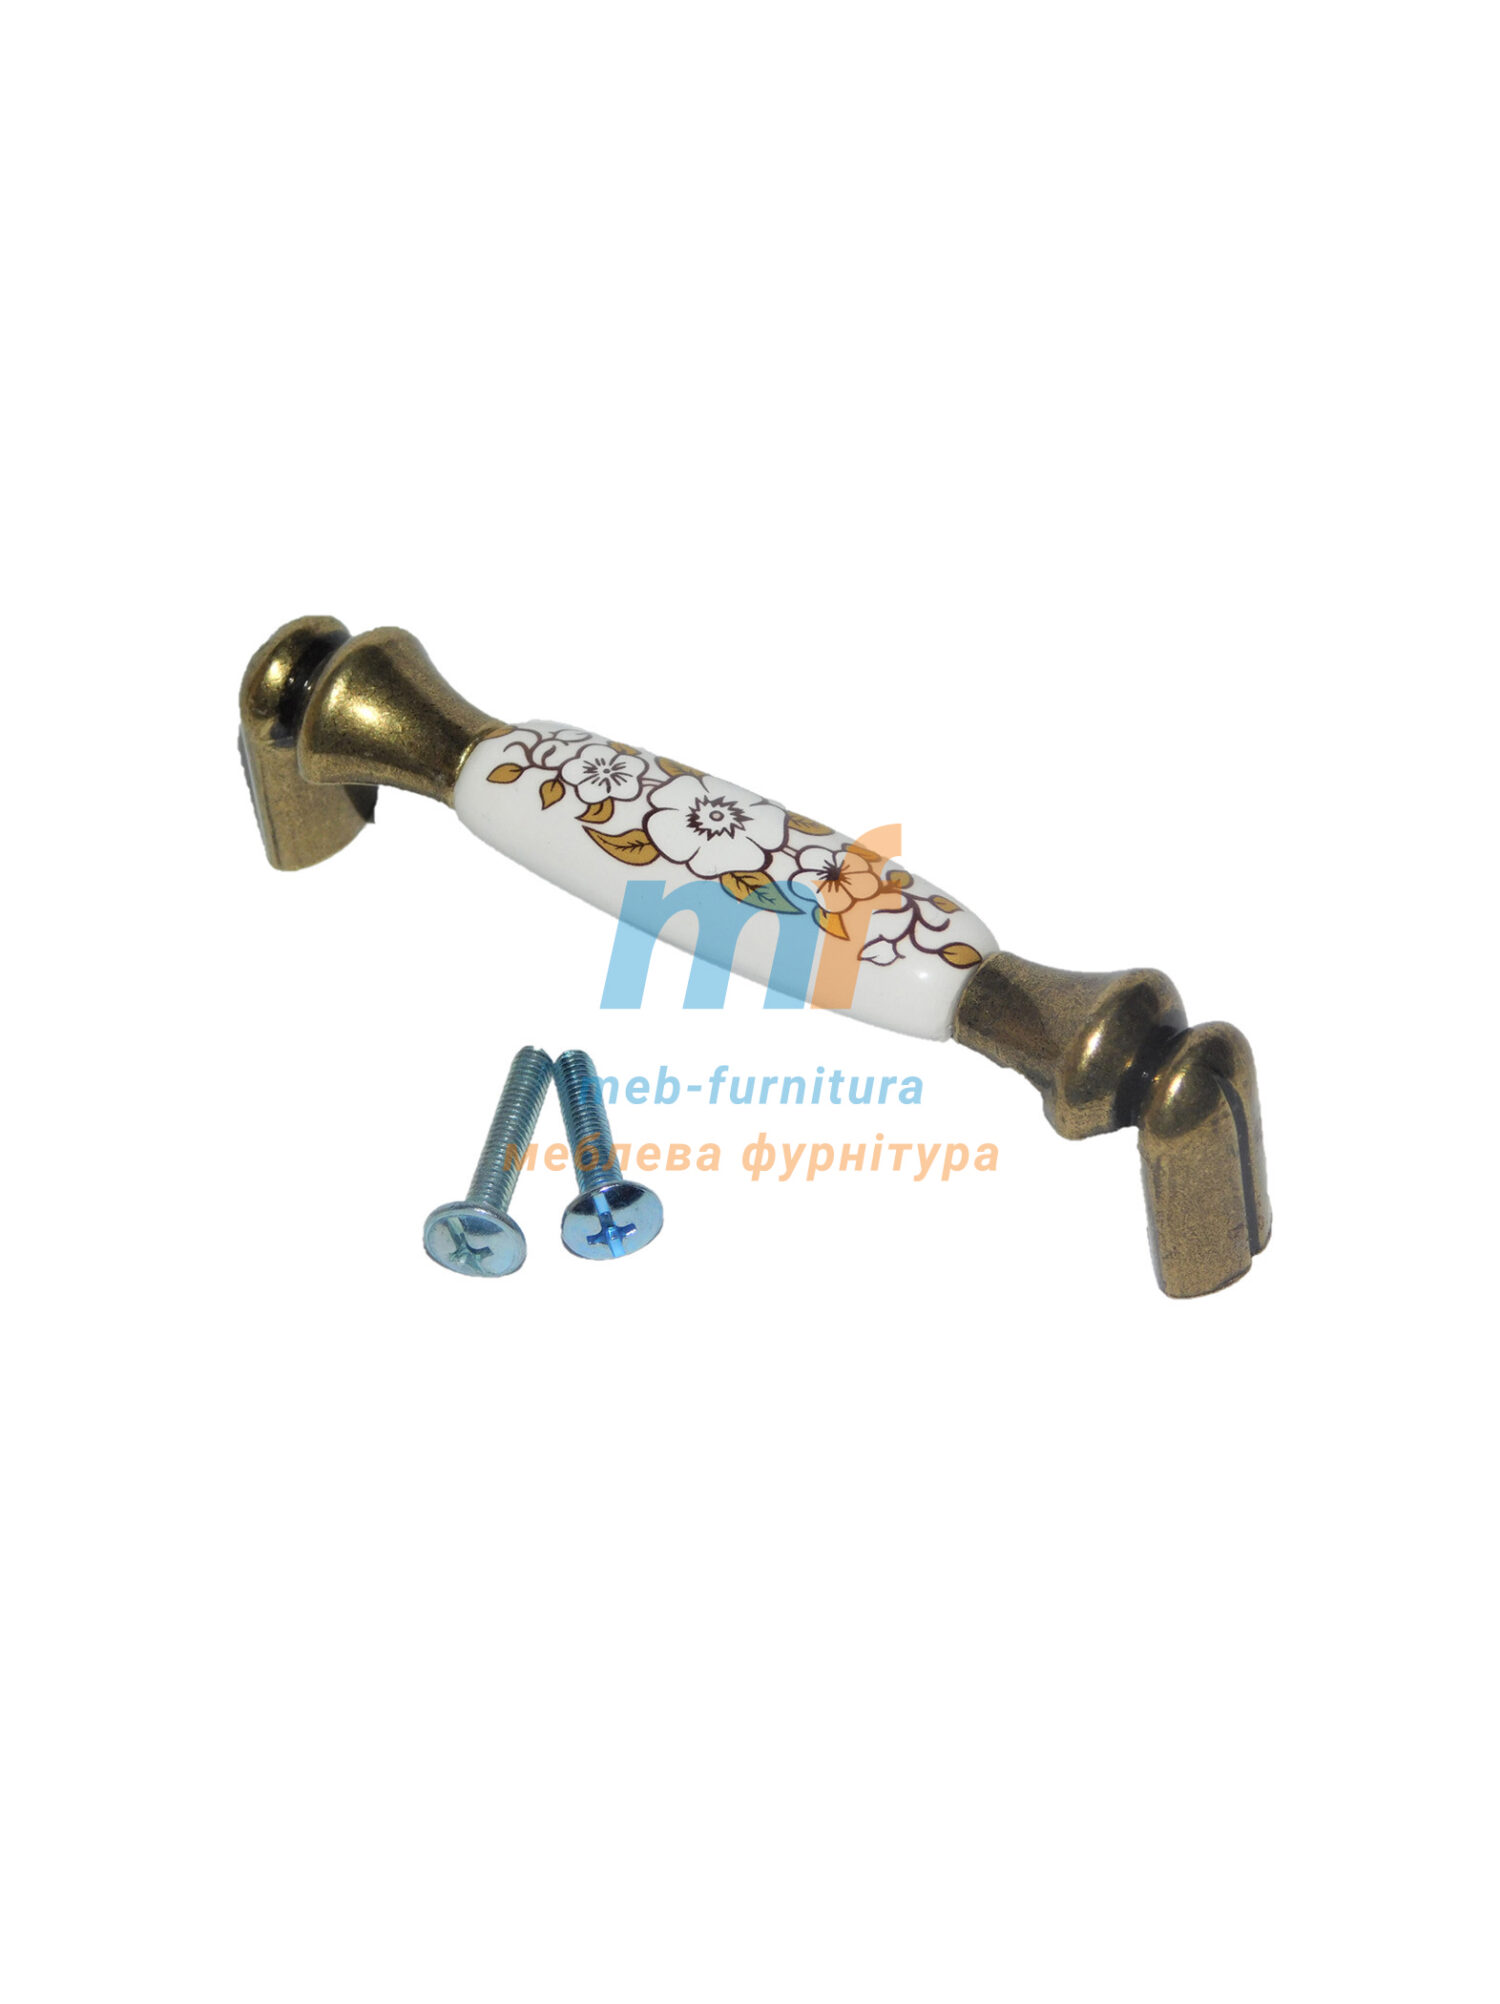 Ручка мебельная керамика KR-11-96mm